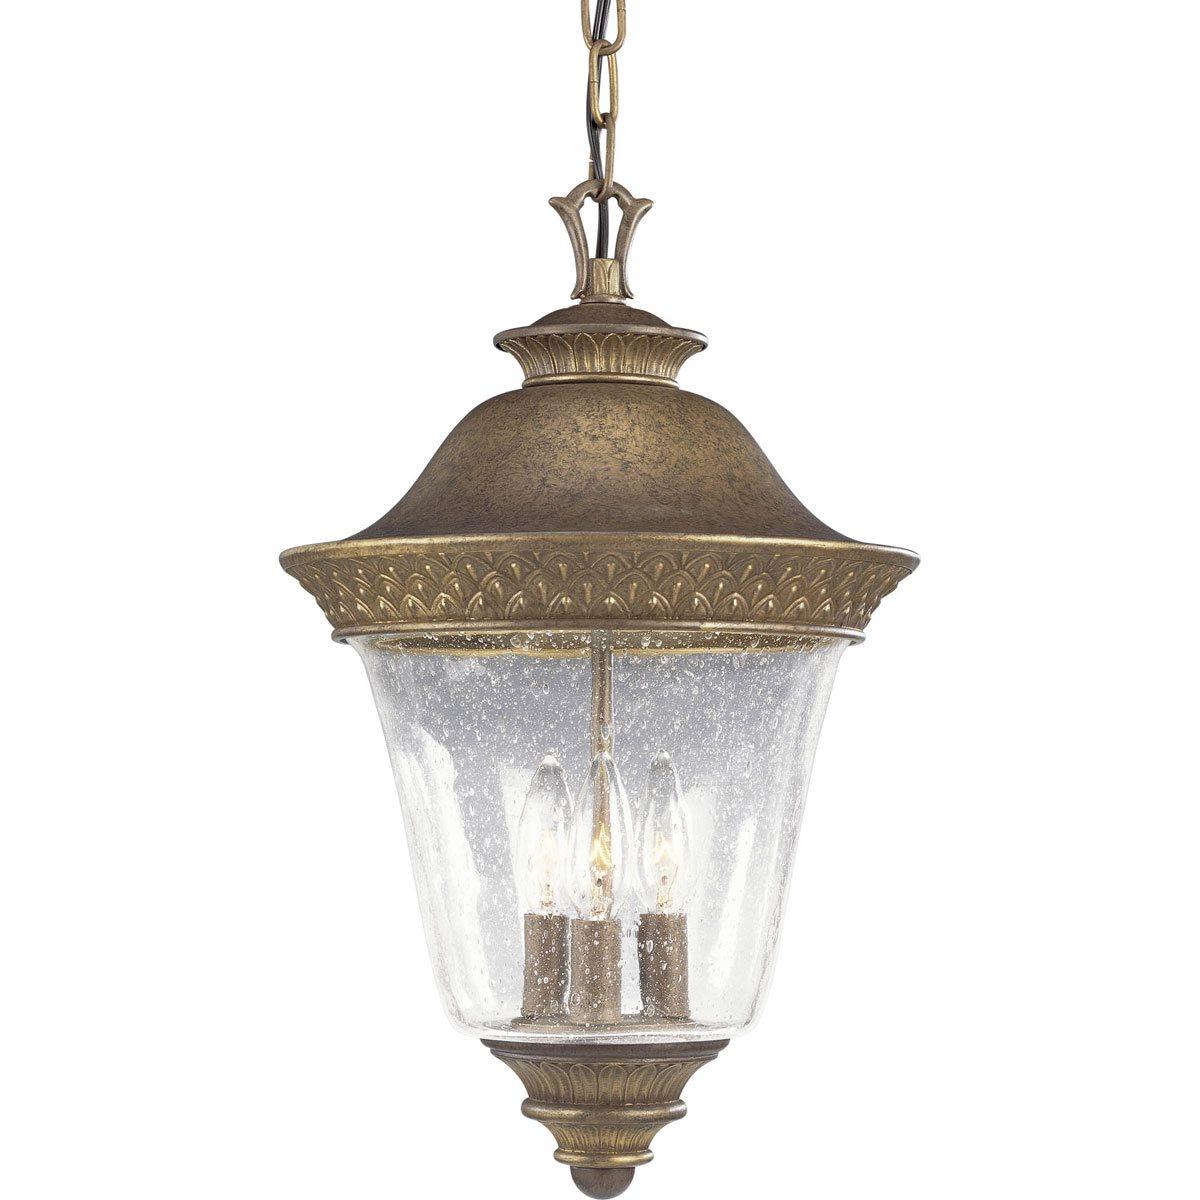 Traditional Outdoor Pendant Lighting : Progress lighting p savannah traditional outdoor